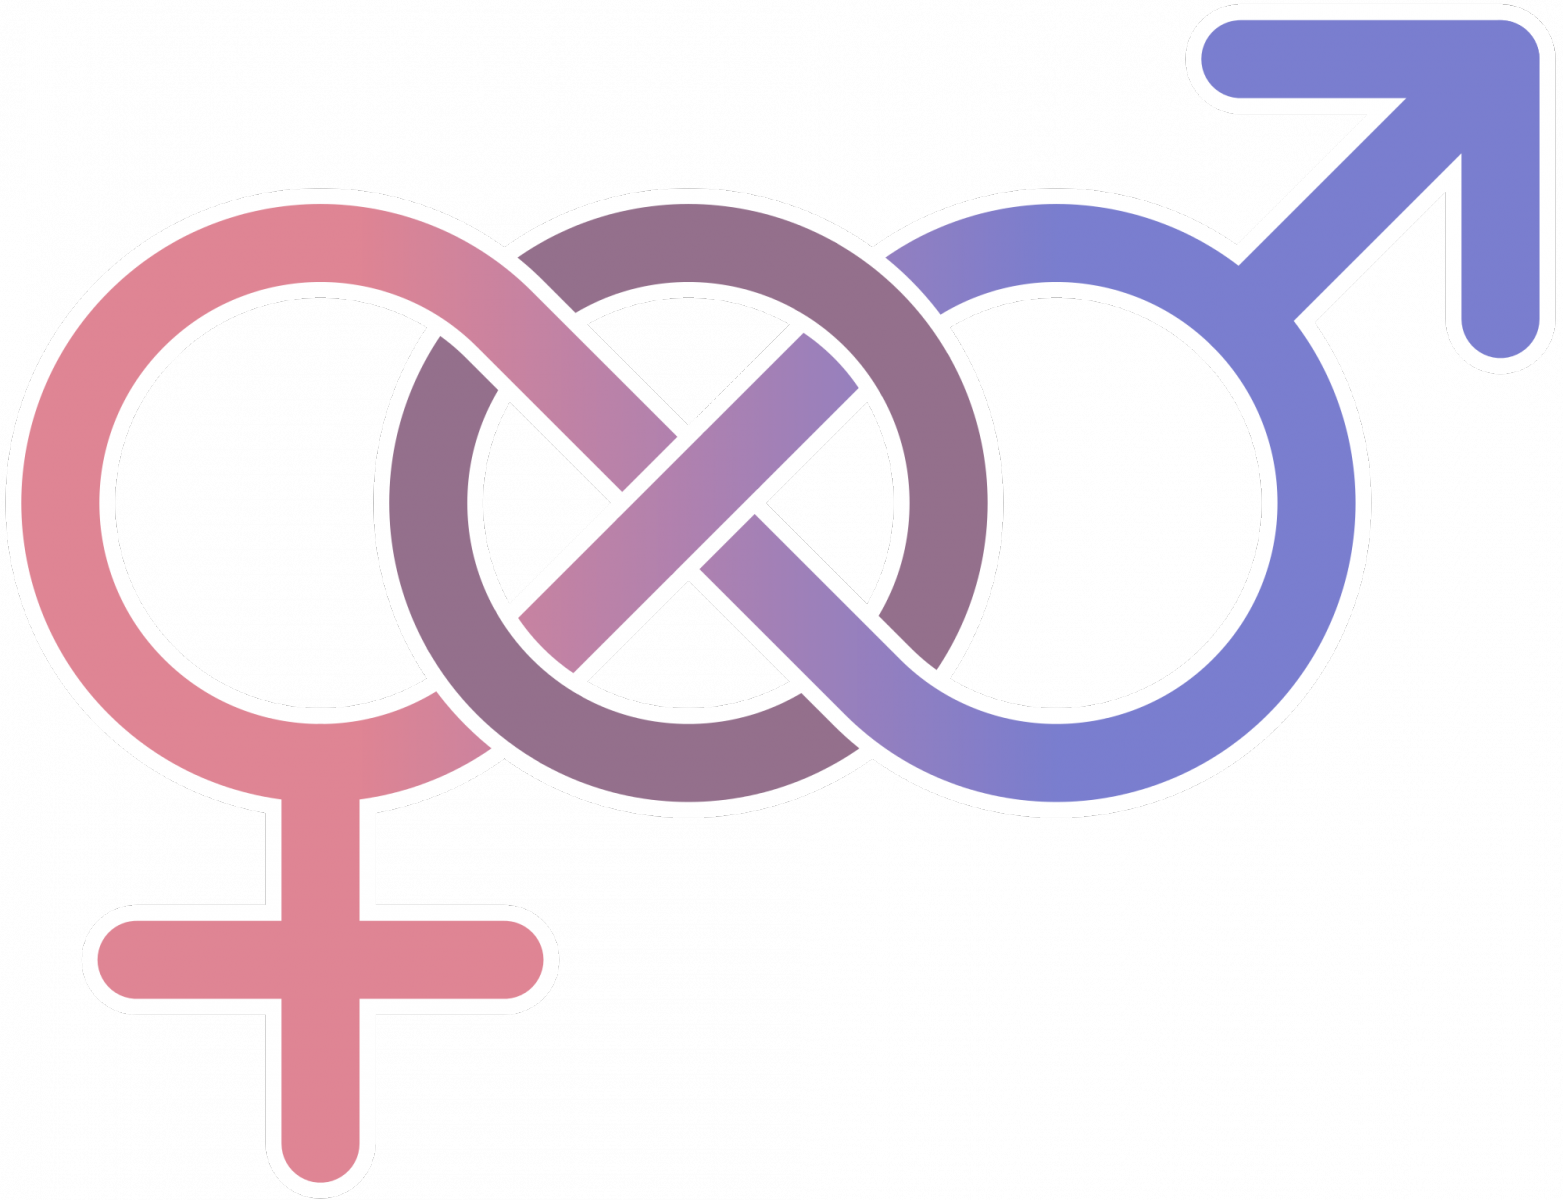 ligestilling i verden Tønder